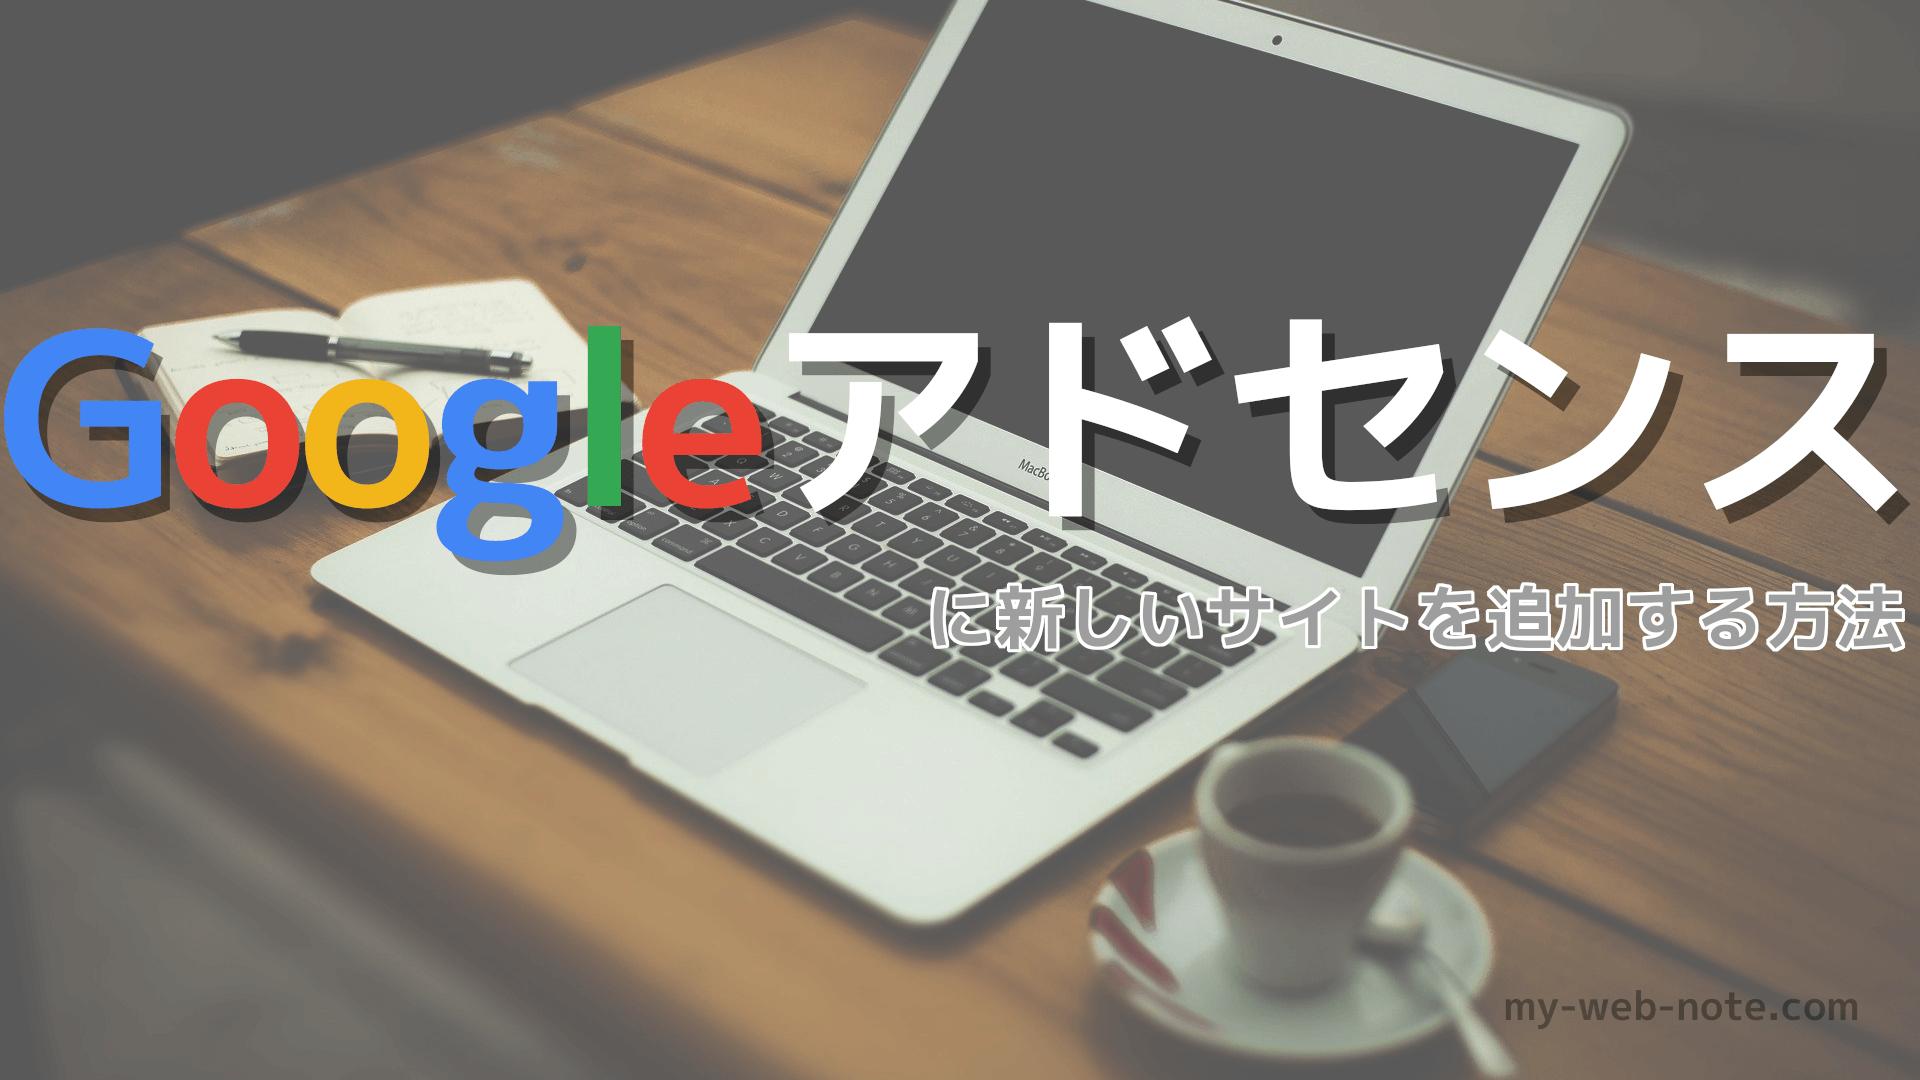 Googleアドセンスに「新しいサイト」を追加する方法と審査に合格するためにやった最低限こと。